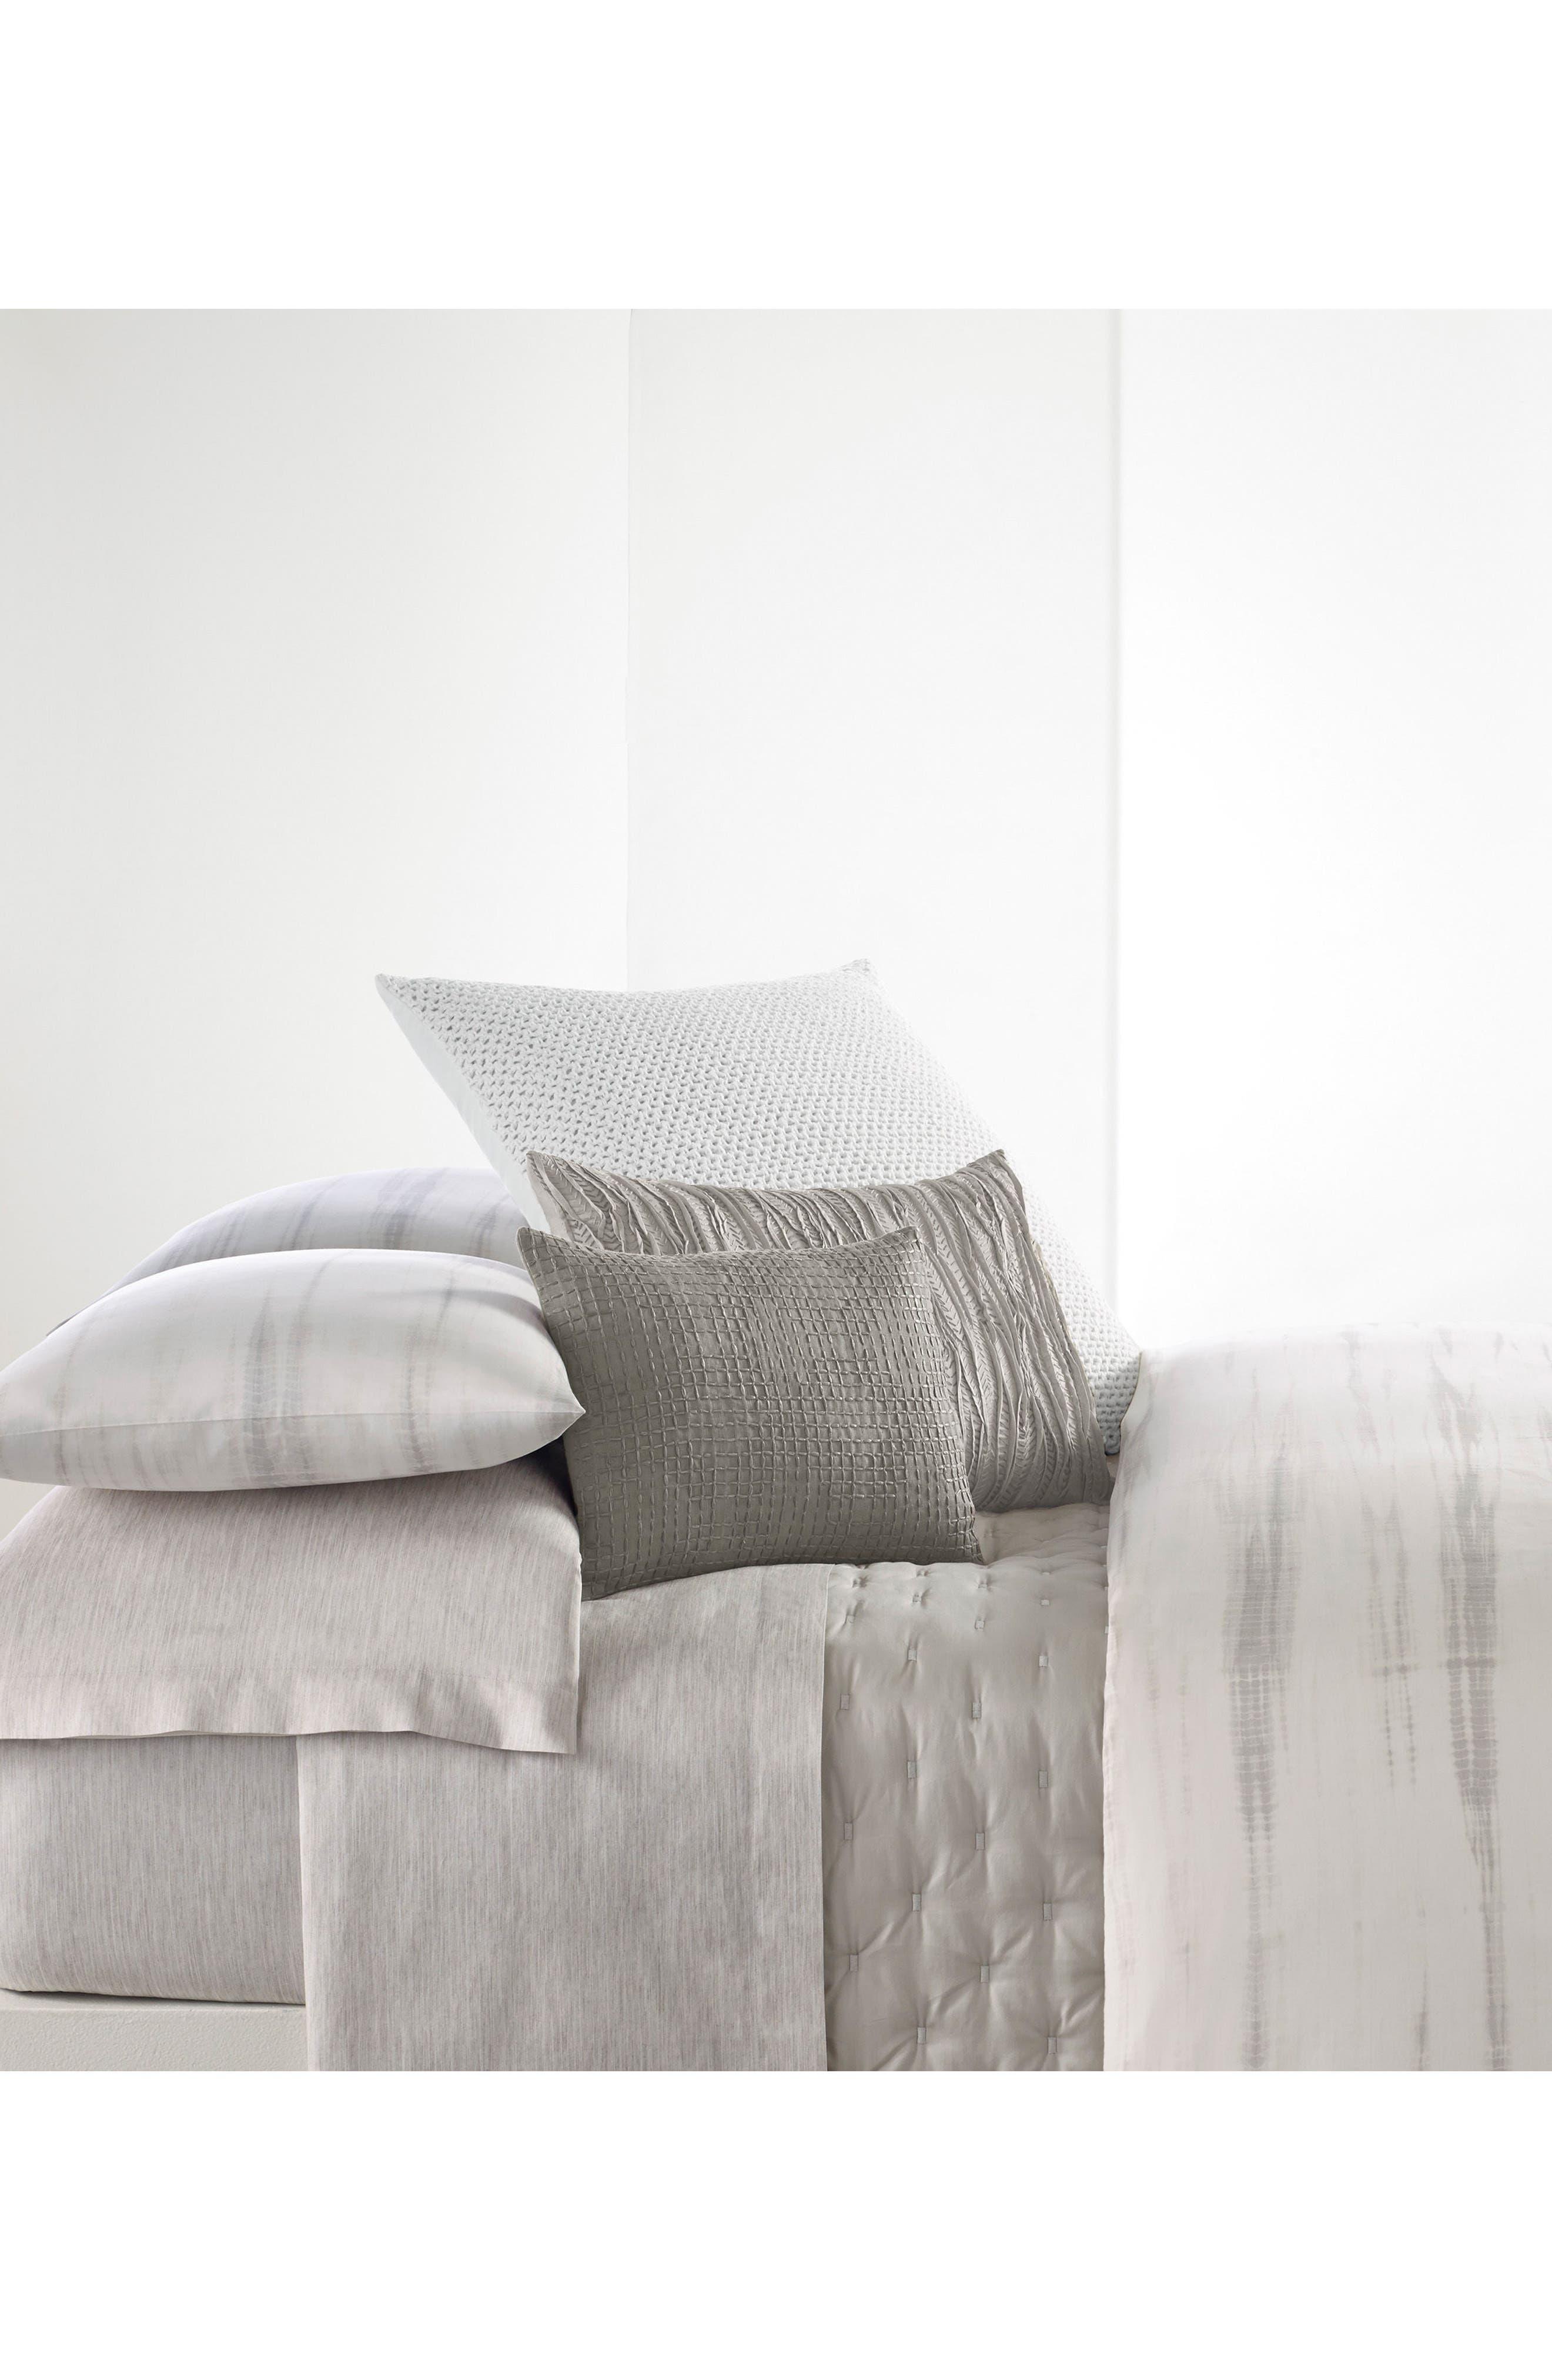 Marble Shibori 350 Thread Count Duvet Cover,                         Main,                         color, Open White